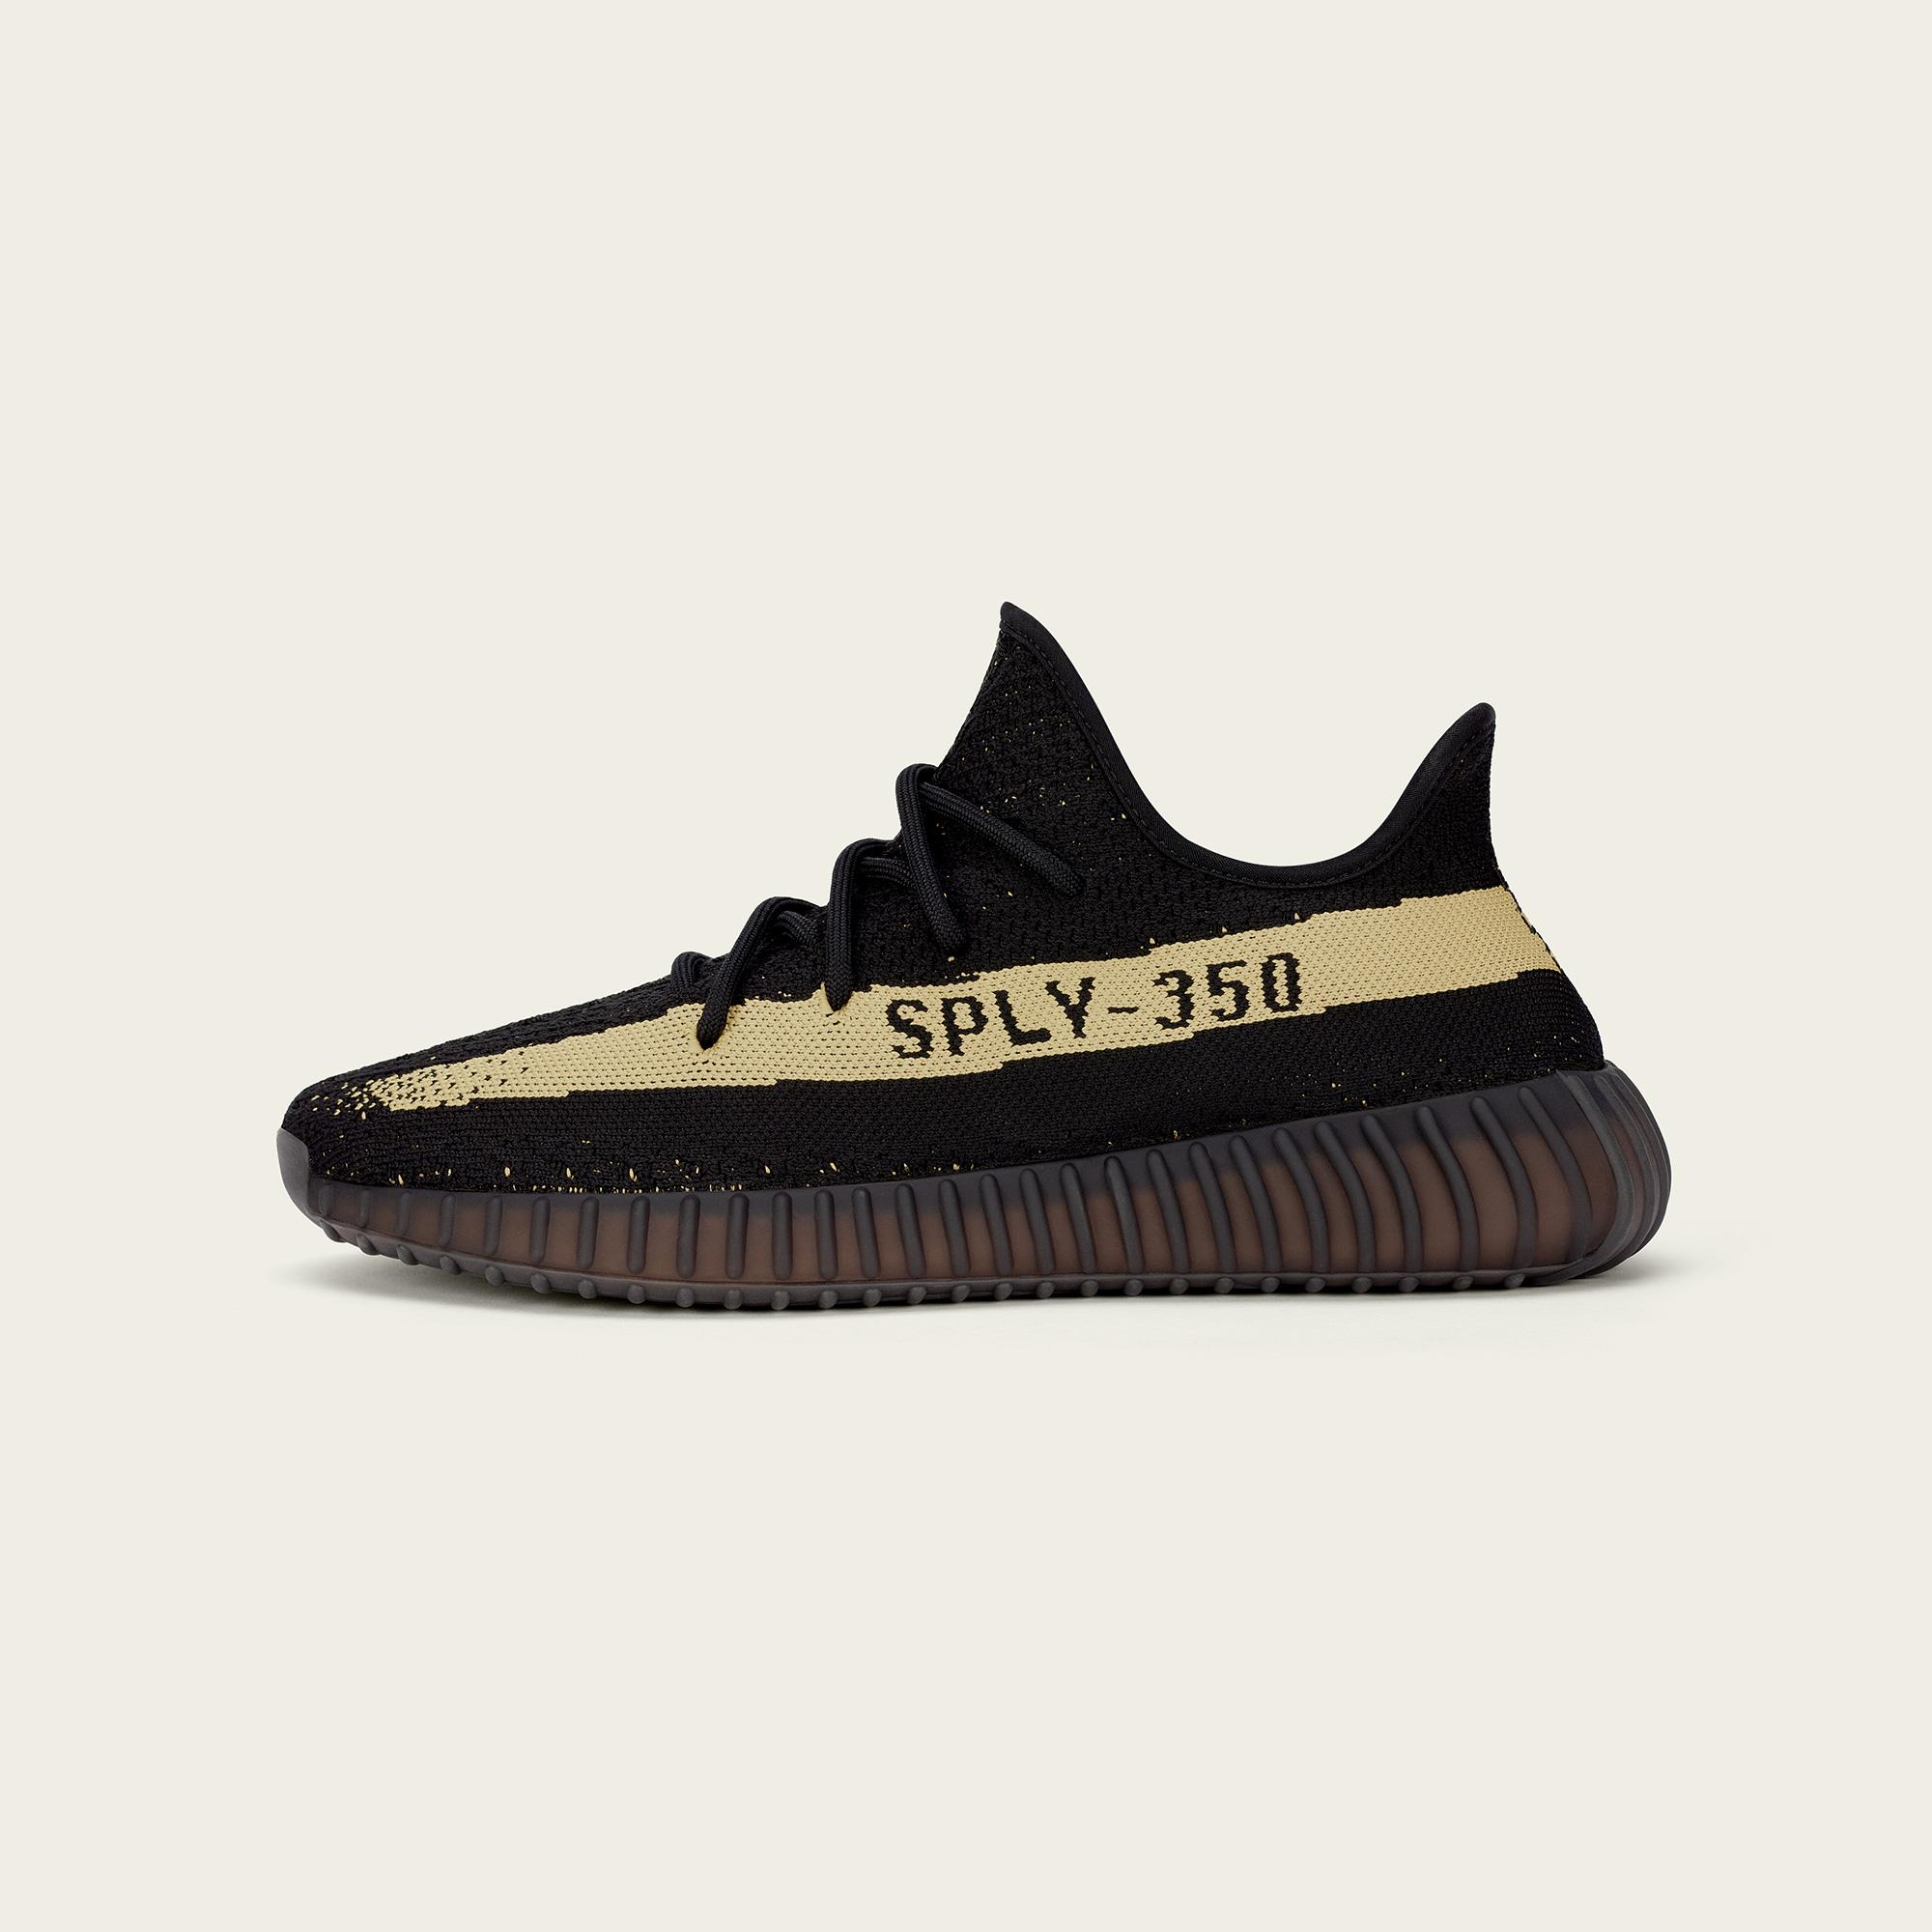 Adidas Originals x Kanye West Yeezy Boost 350 V2  10e006d72